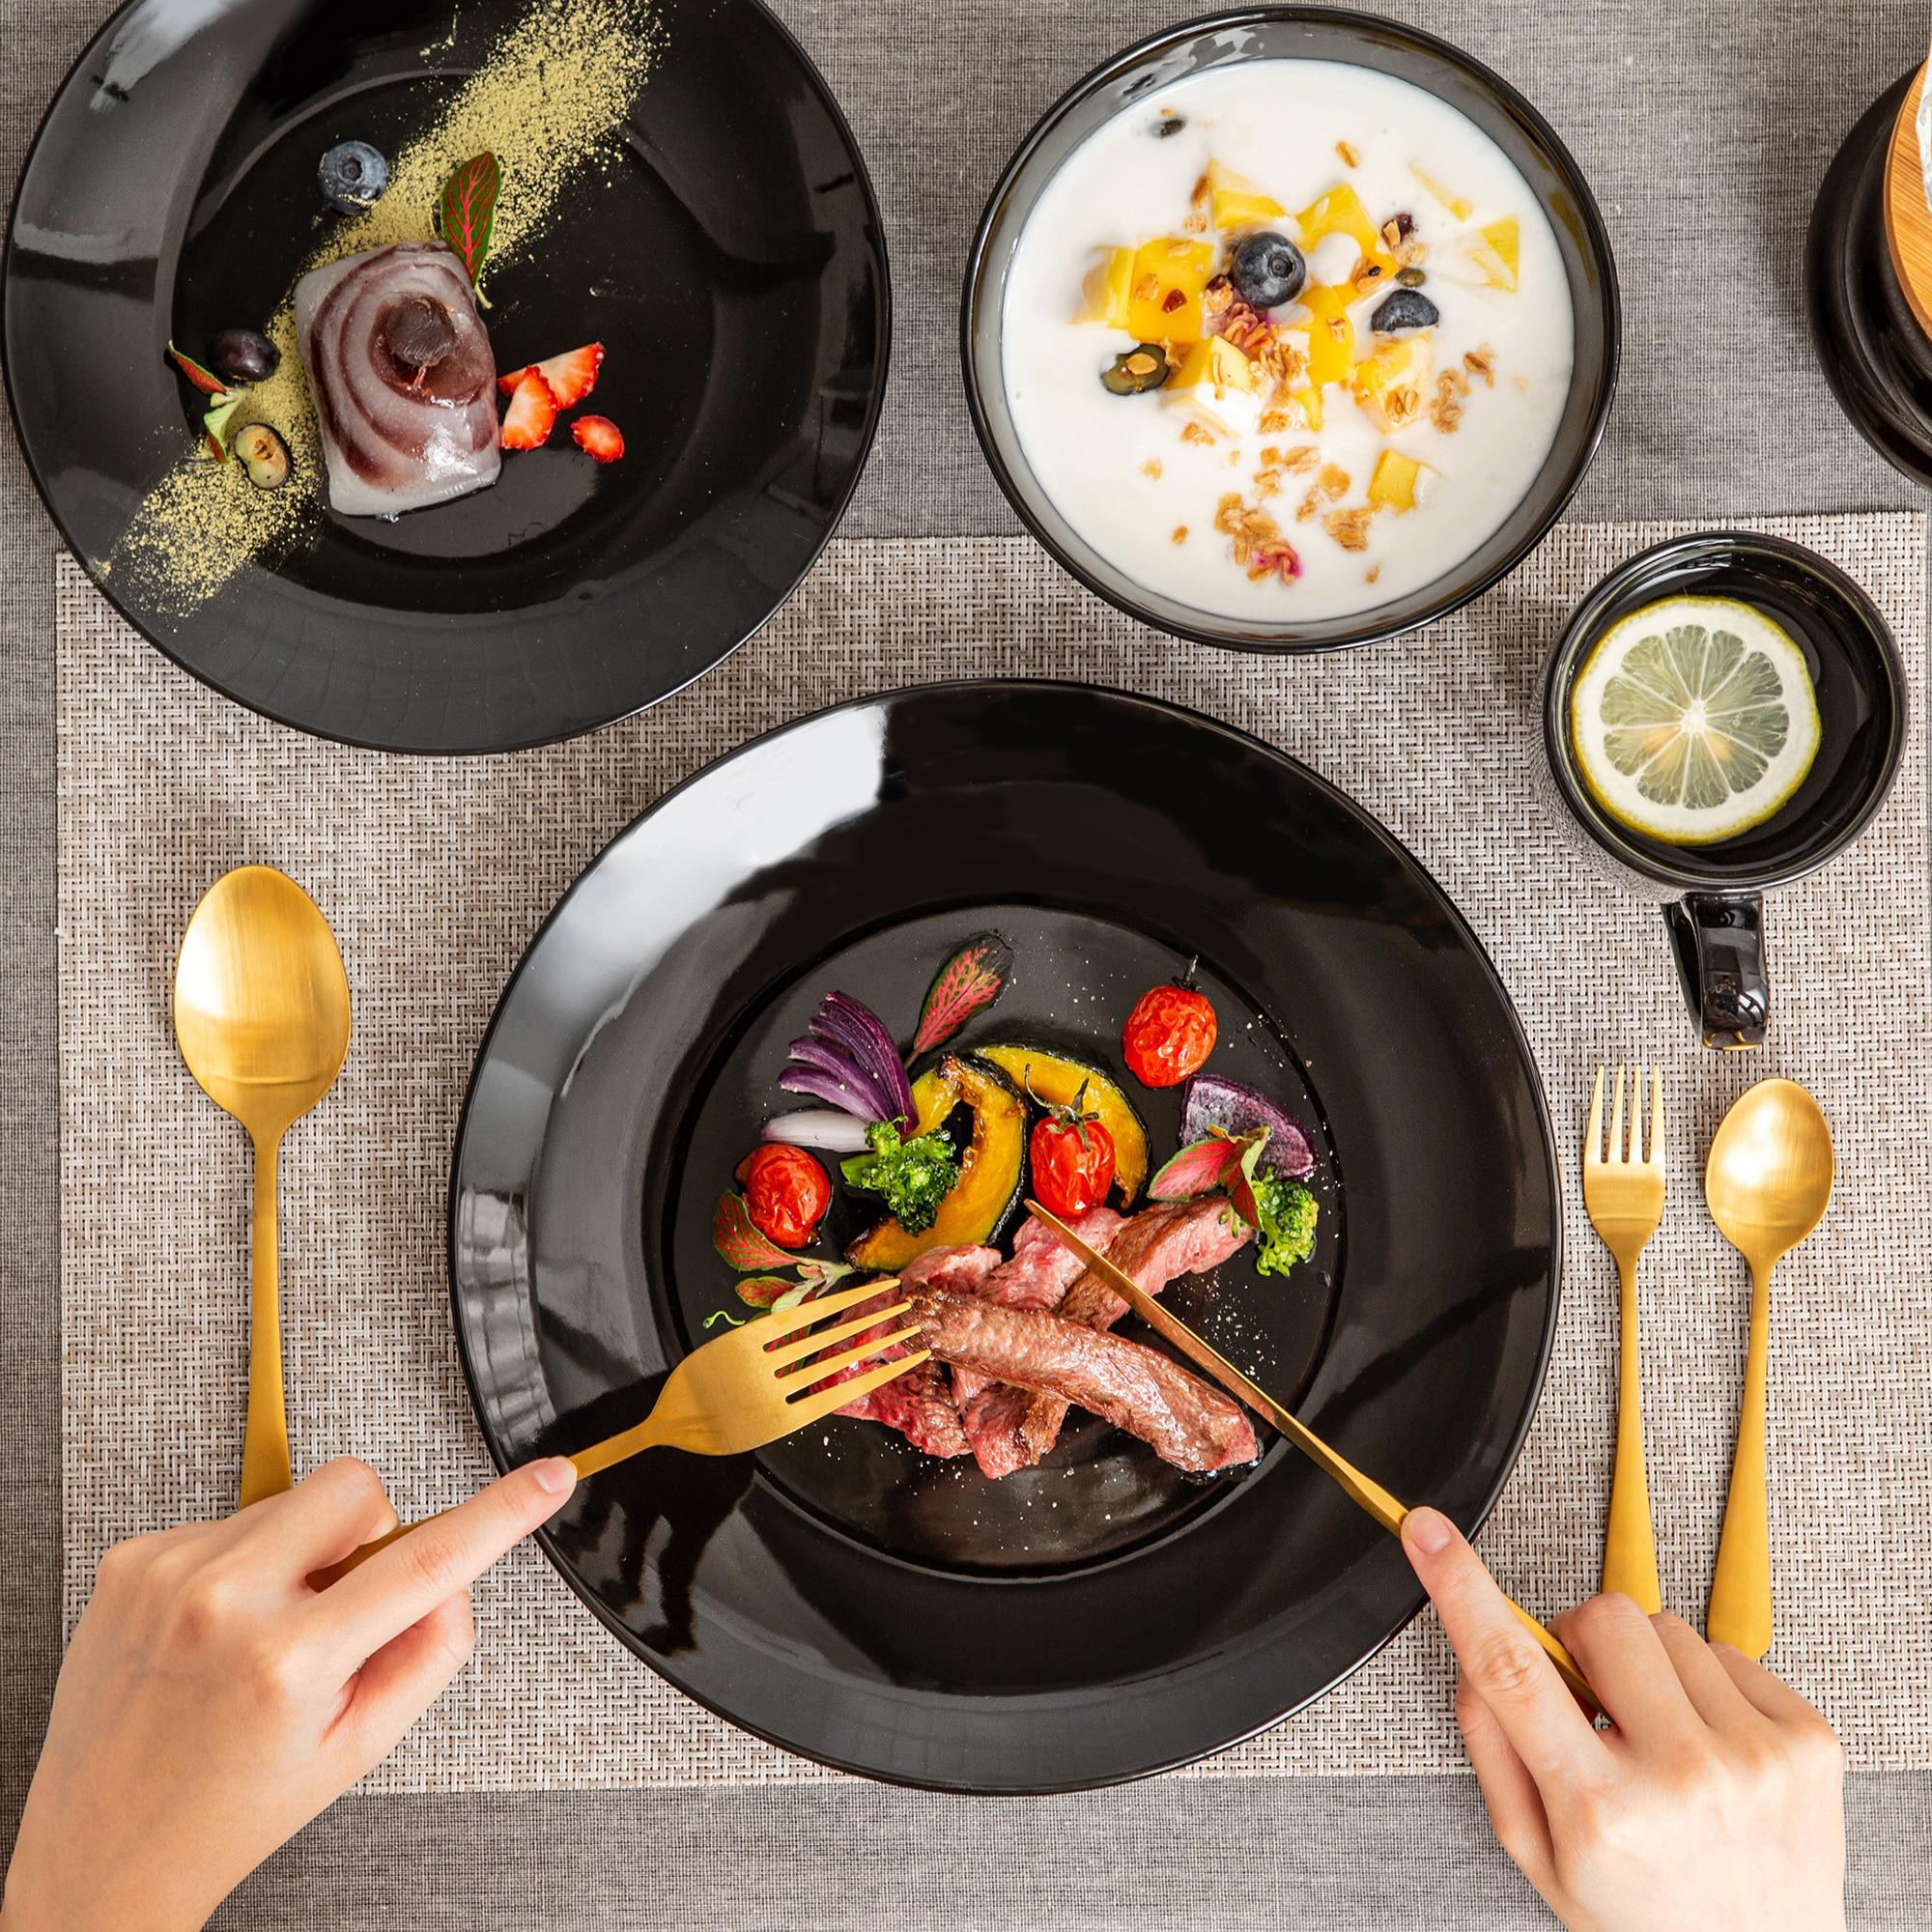 LOVECASA DS 16/32/48-Piece Black Ceramic Porcelain Dinnerware Tableware Dinner Set with Dinner Plate,Dessert Plate,Bowl,Mug Set